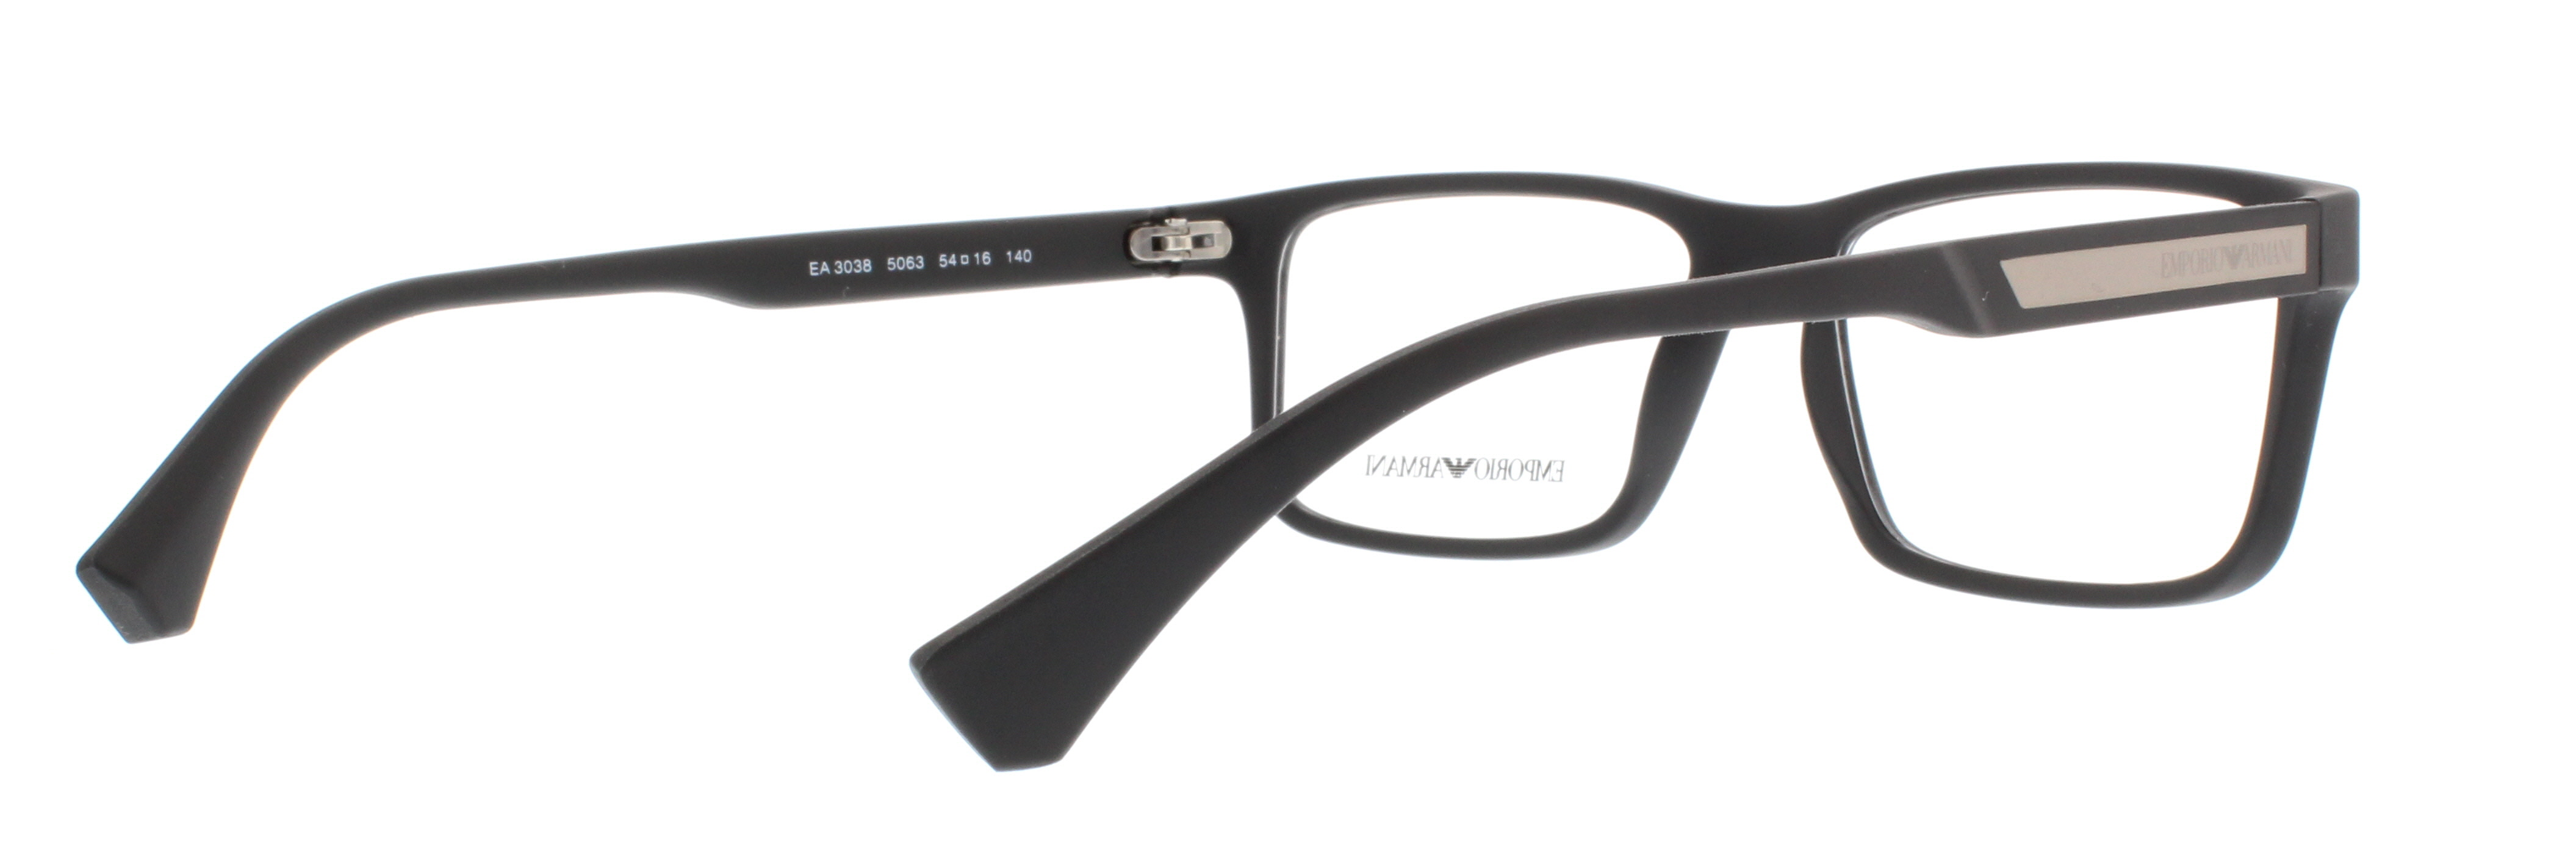 EMPORIO ARMANI Eyeglasses EA3038 5063 Black Rubber 54MM ...